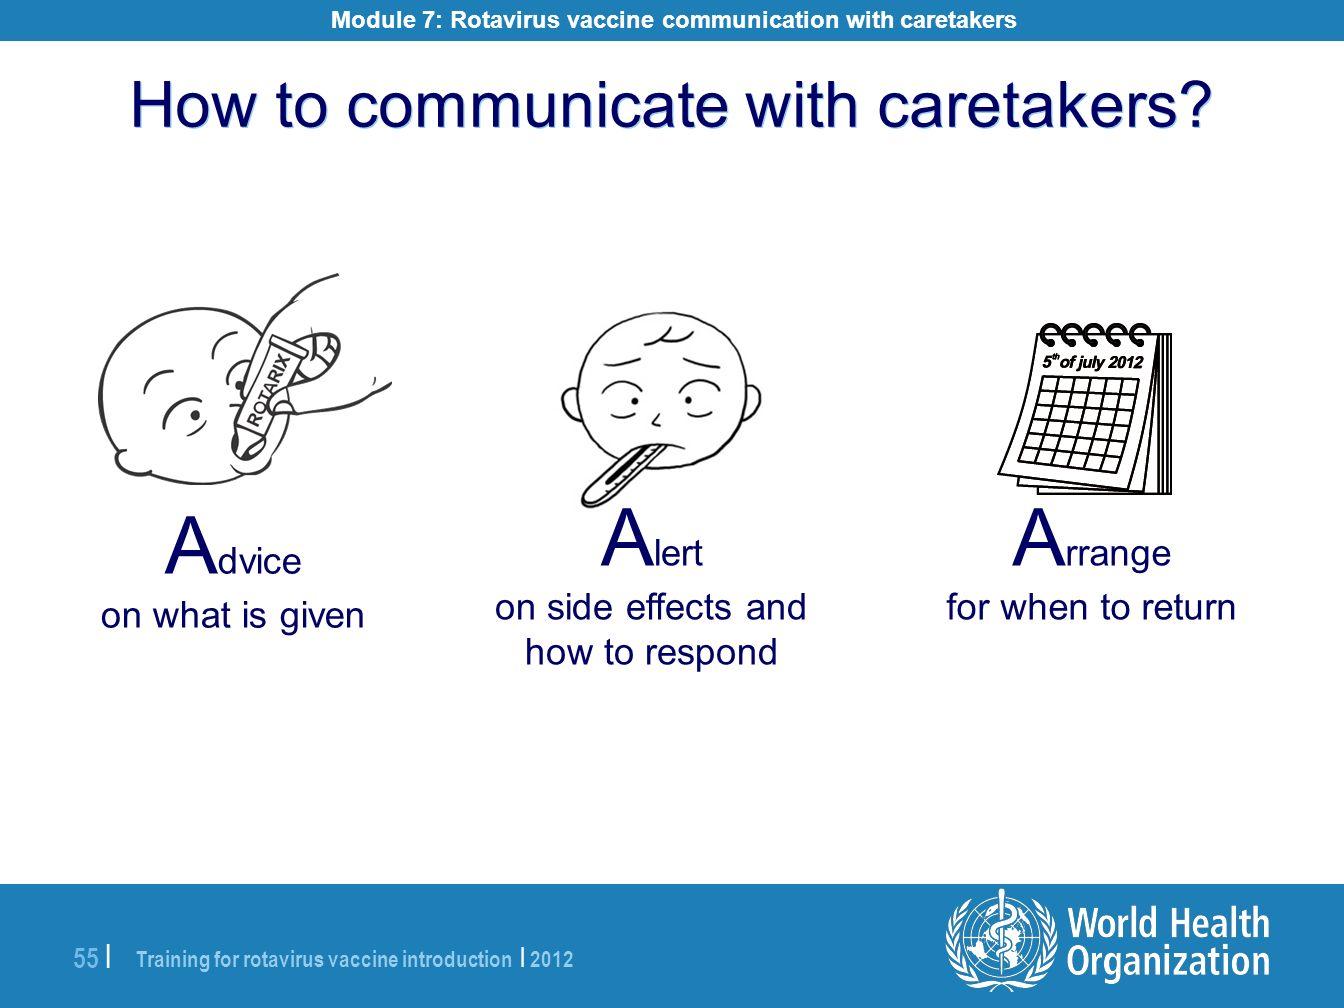 Module 7: Rotavirus vaccine communication with caretakers